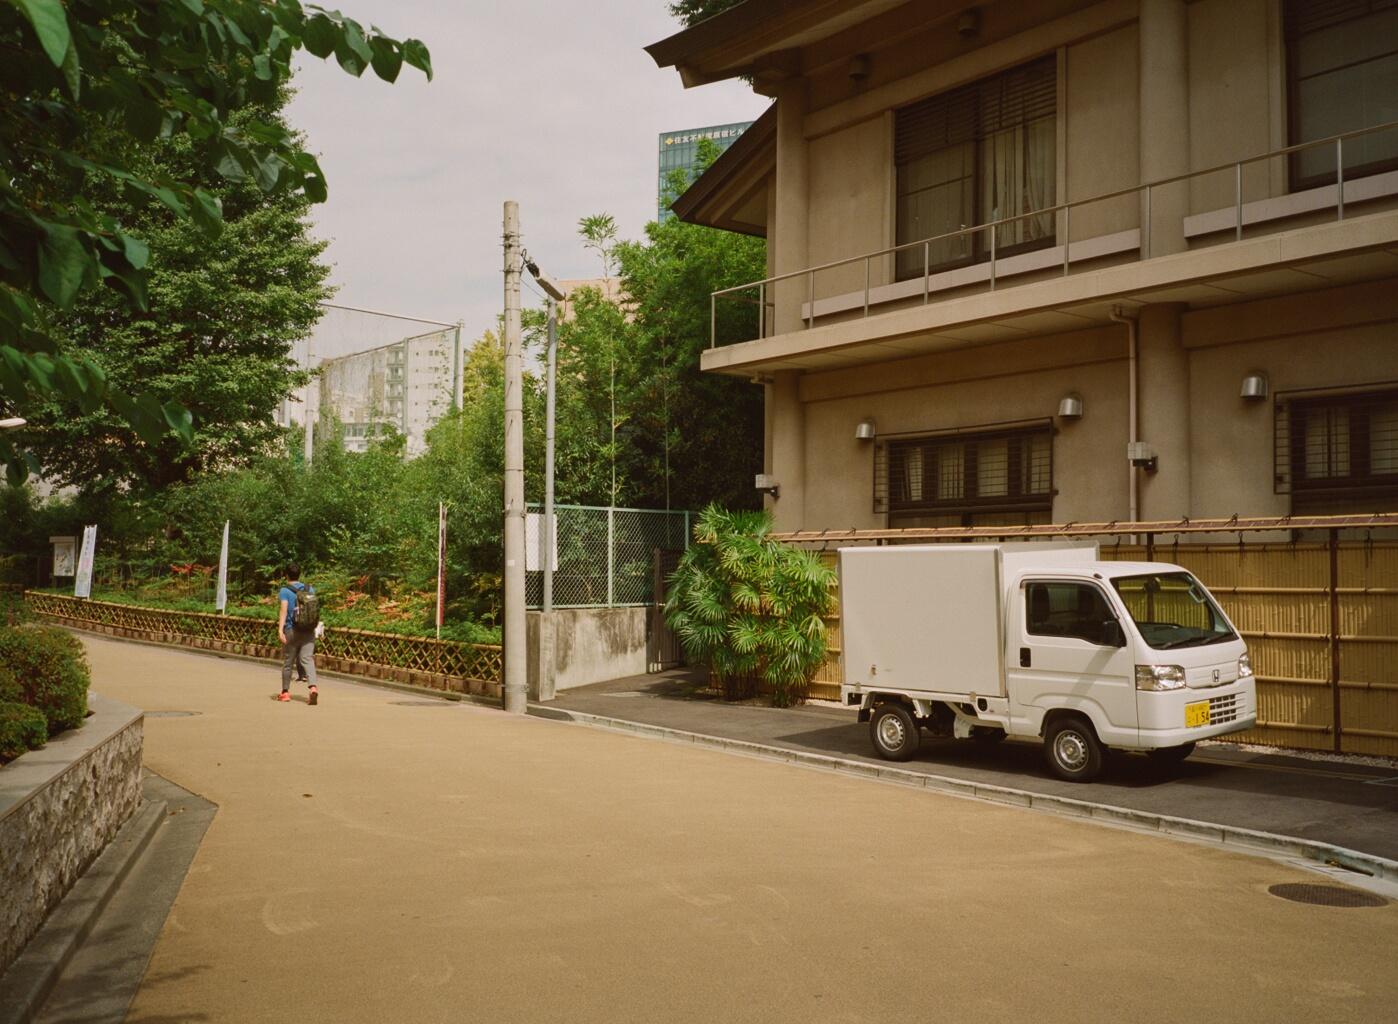 00A20006.JPG